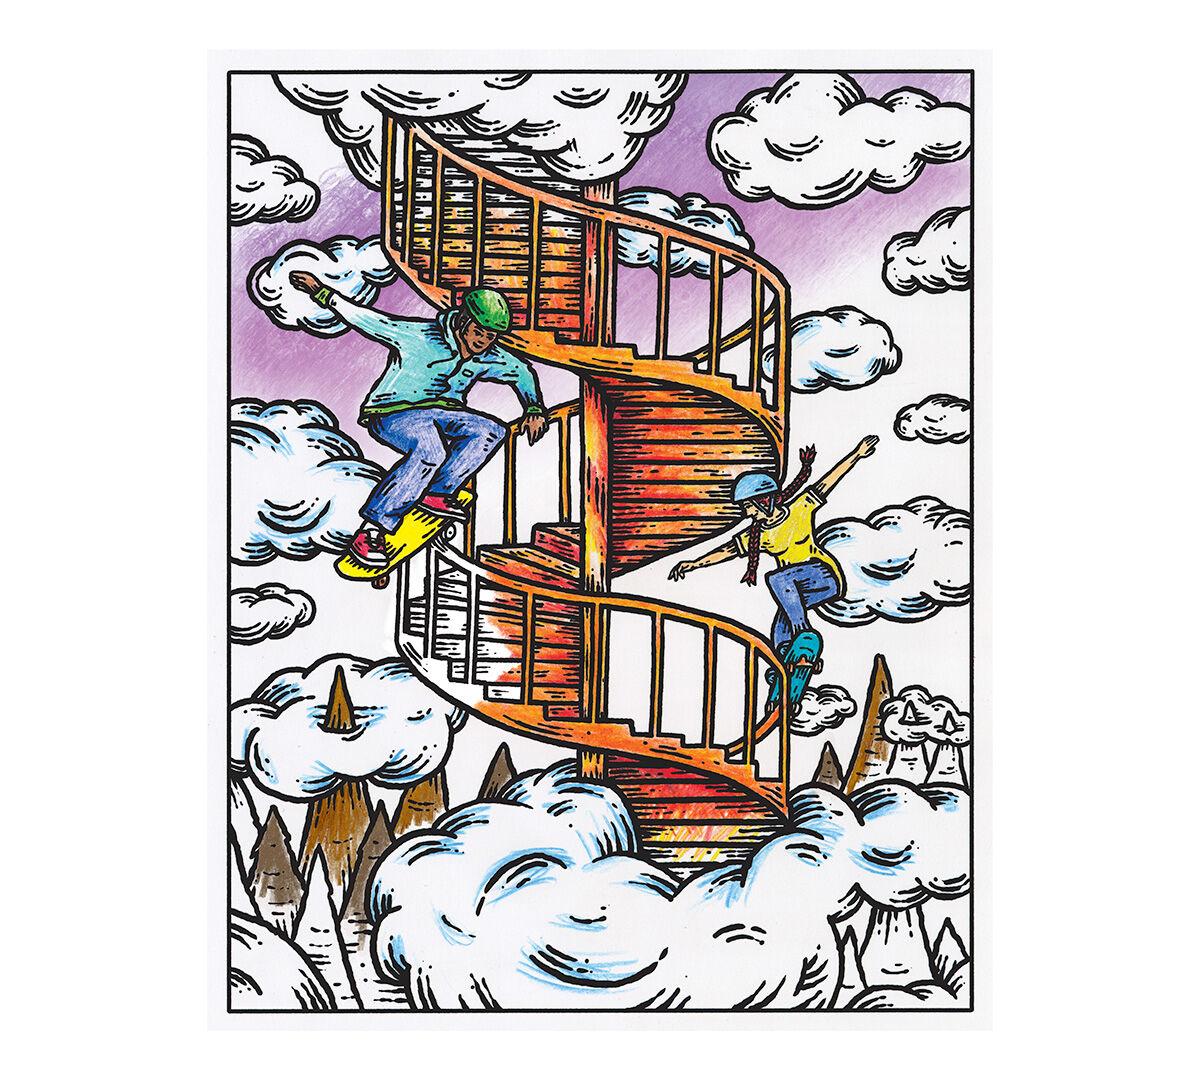 Art with Edge, Get Surreal - Crayola